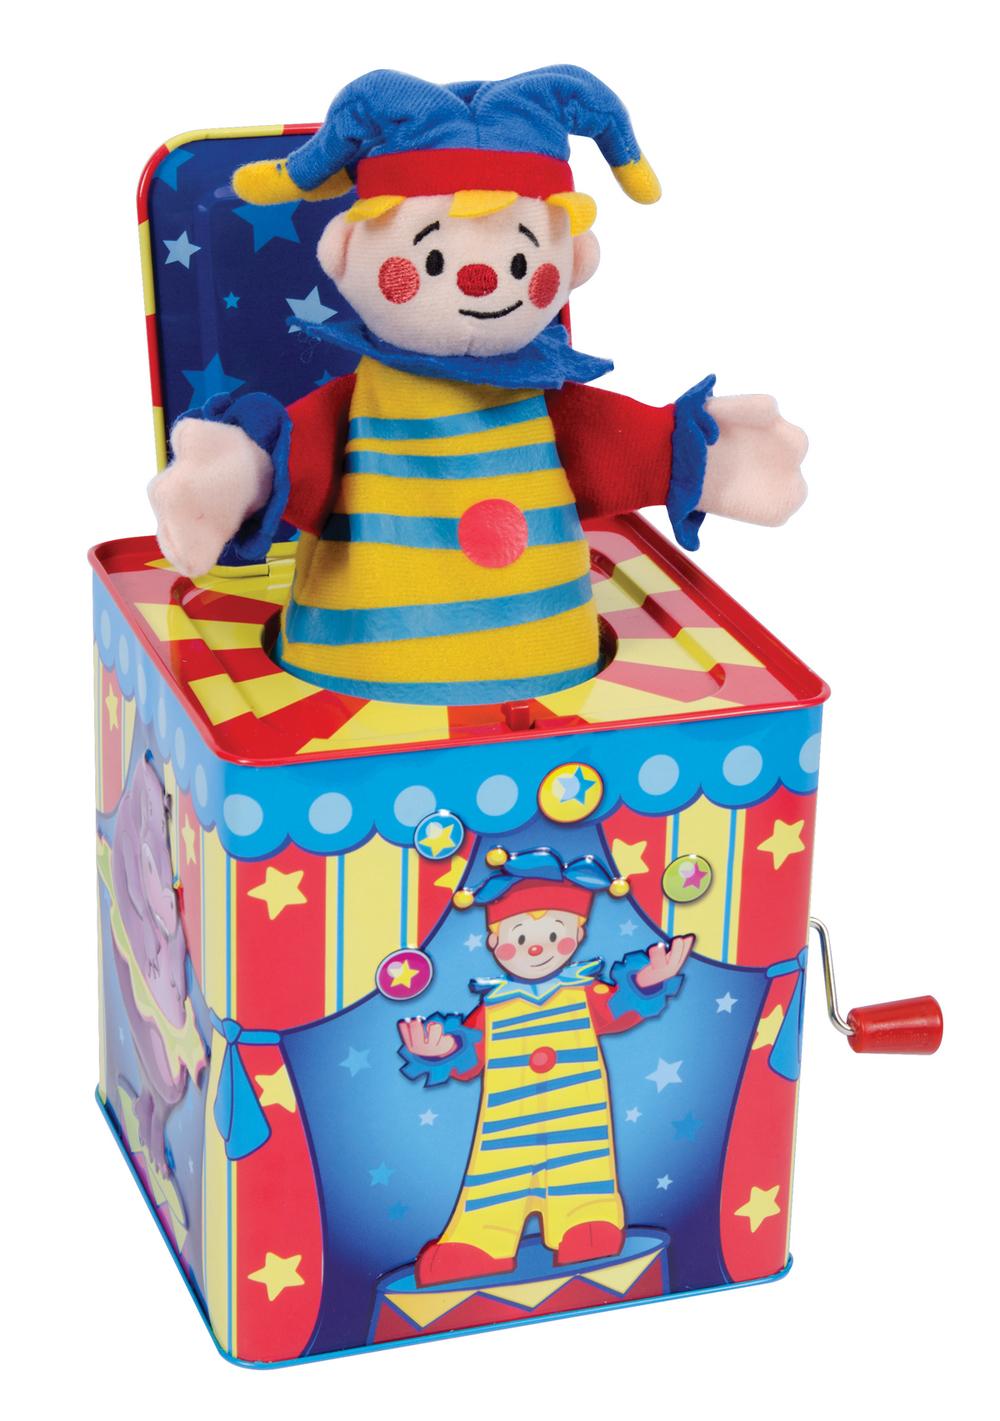 silly-circus-jack-in-the-box-scjb.jpg